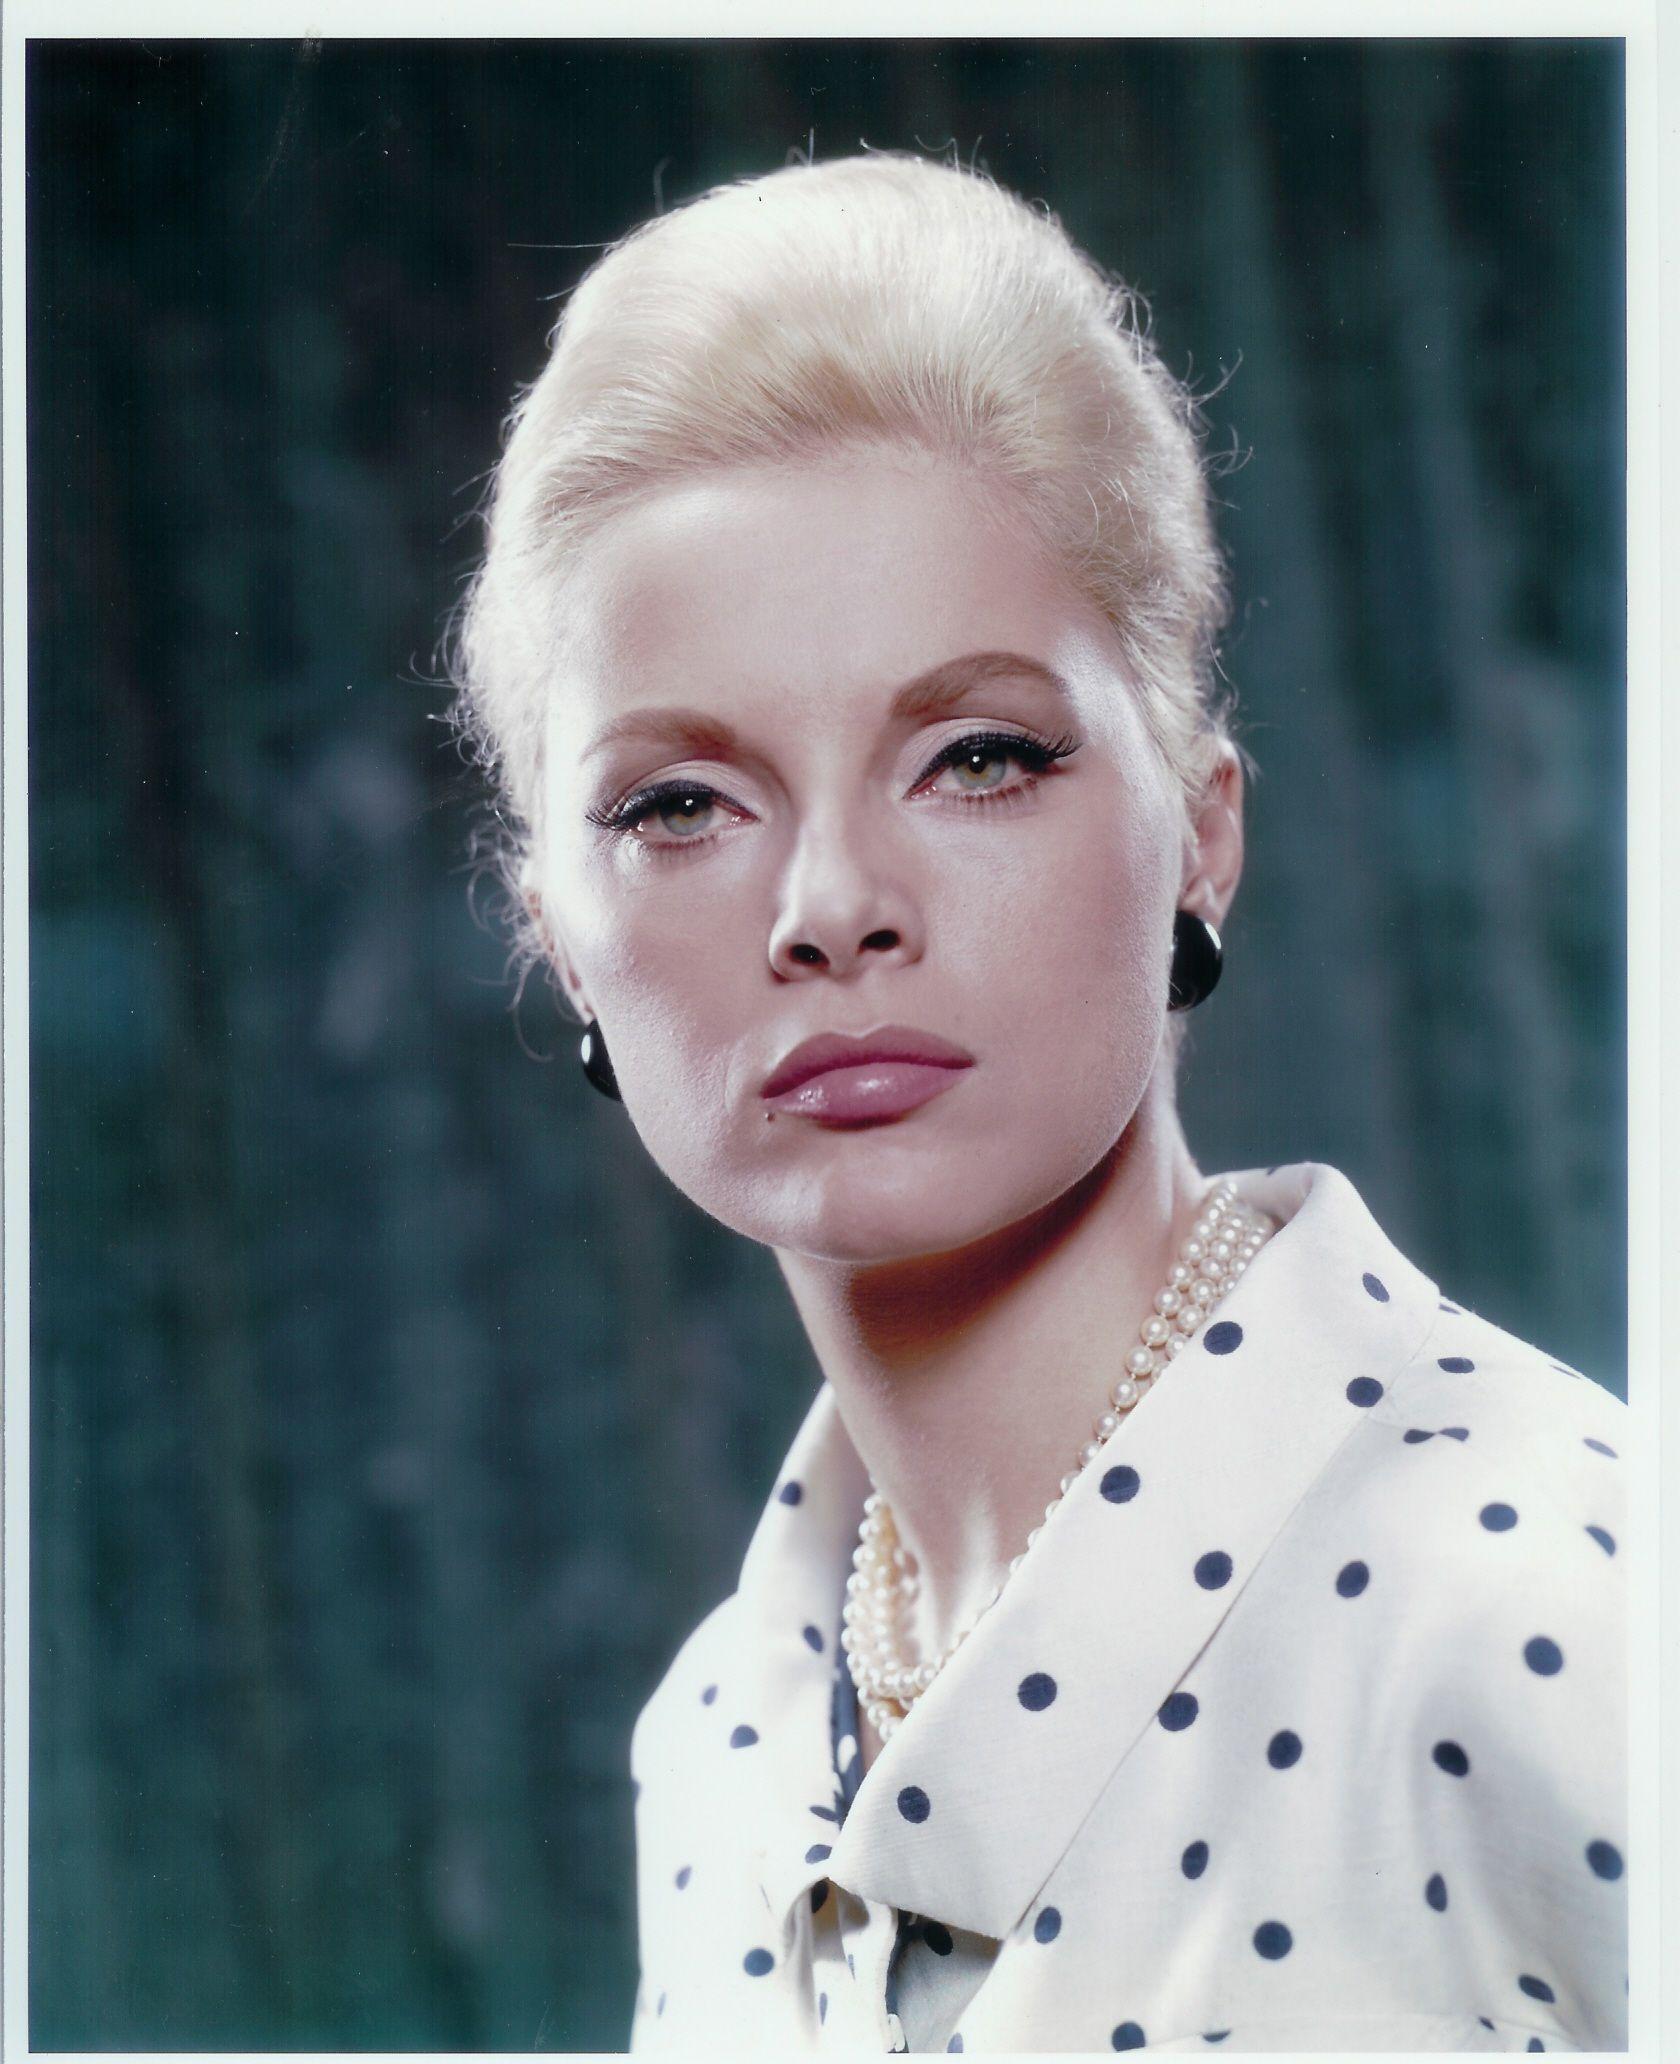 Margaret Phillips,Carmen Electra United States XXX pictures Stephanie Zimbalist born October 8, 1956 (age 62),Mathira